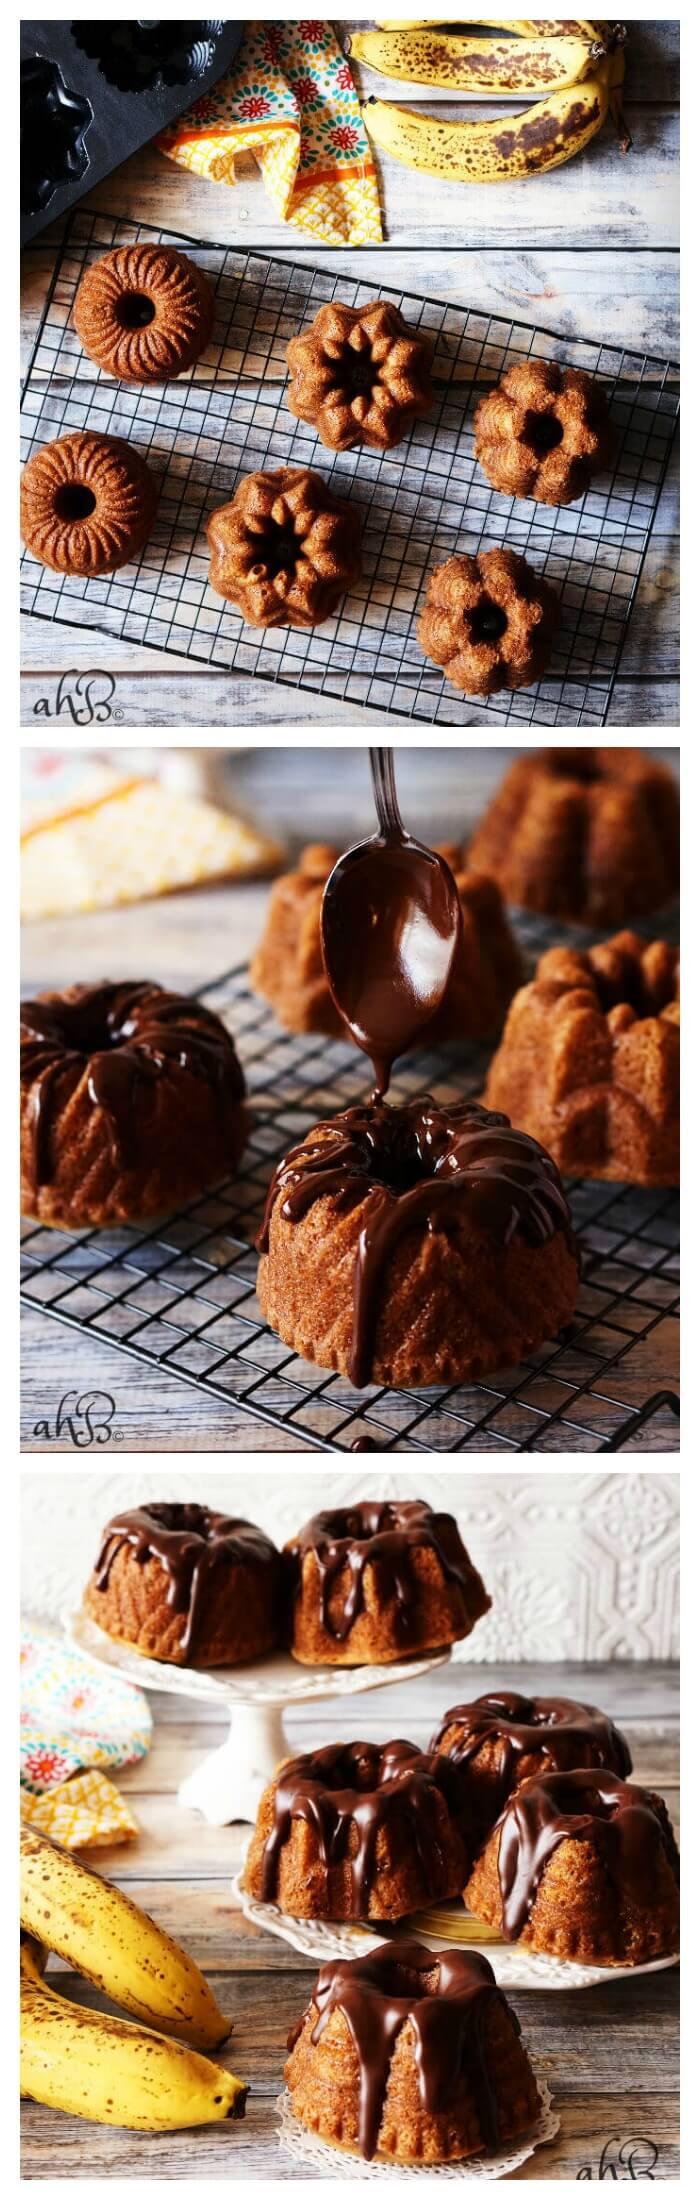 Mini Banana Bundt Cakes with Chocolate Nutella Ganache